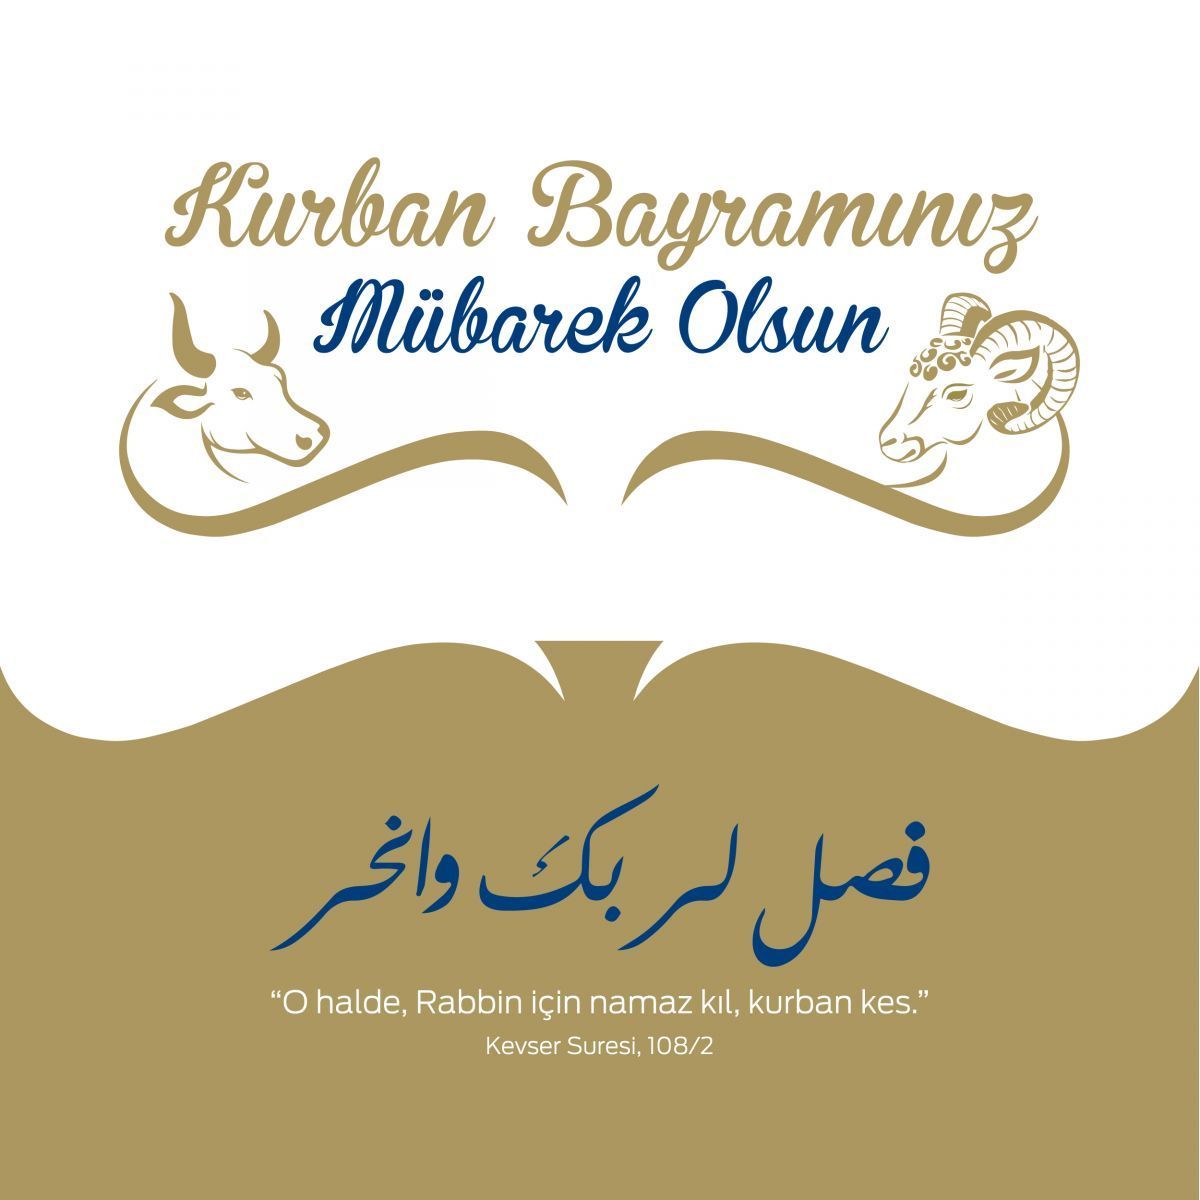 Vektorel Cizim Kurban Bayraminiz Mubarek Olsun Home Decor Decals Calligraphy Arabic Calligraphy